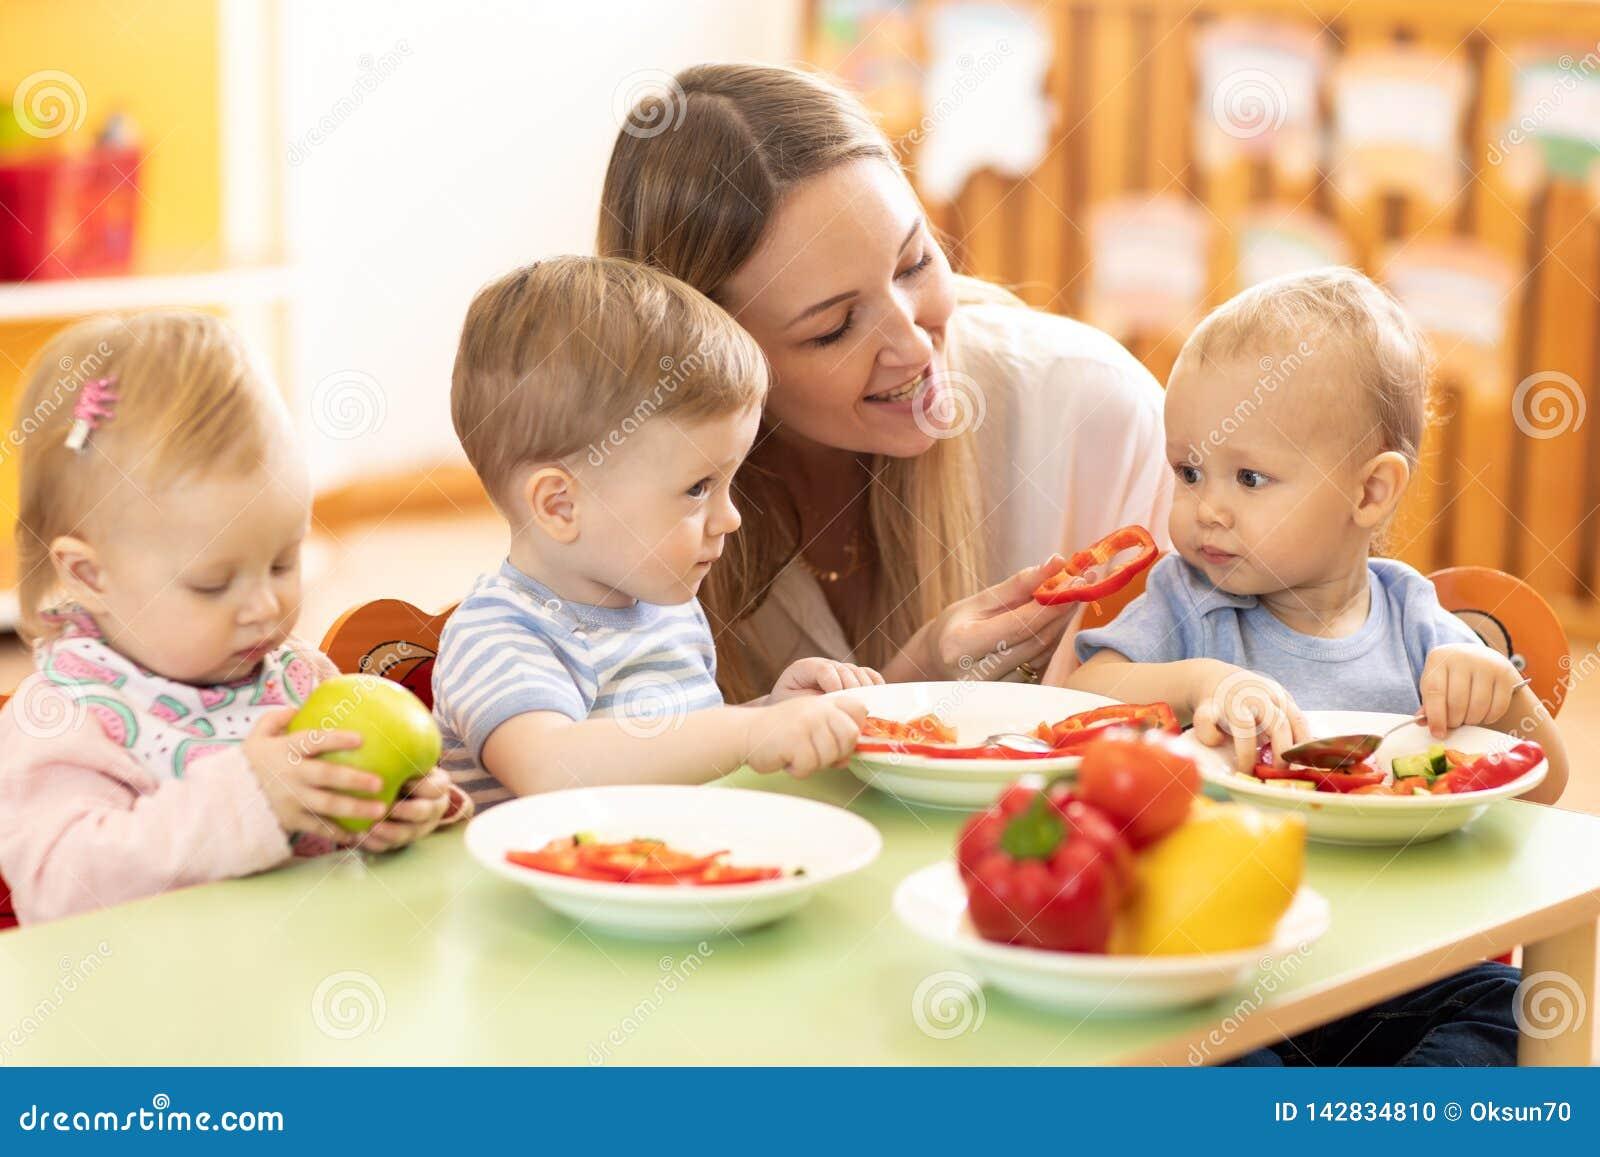 Babysitter feeding nursery babies. Toddlers eat healthy food in daycare